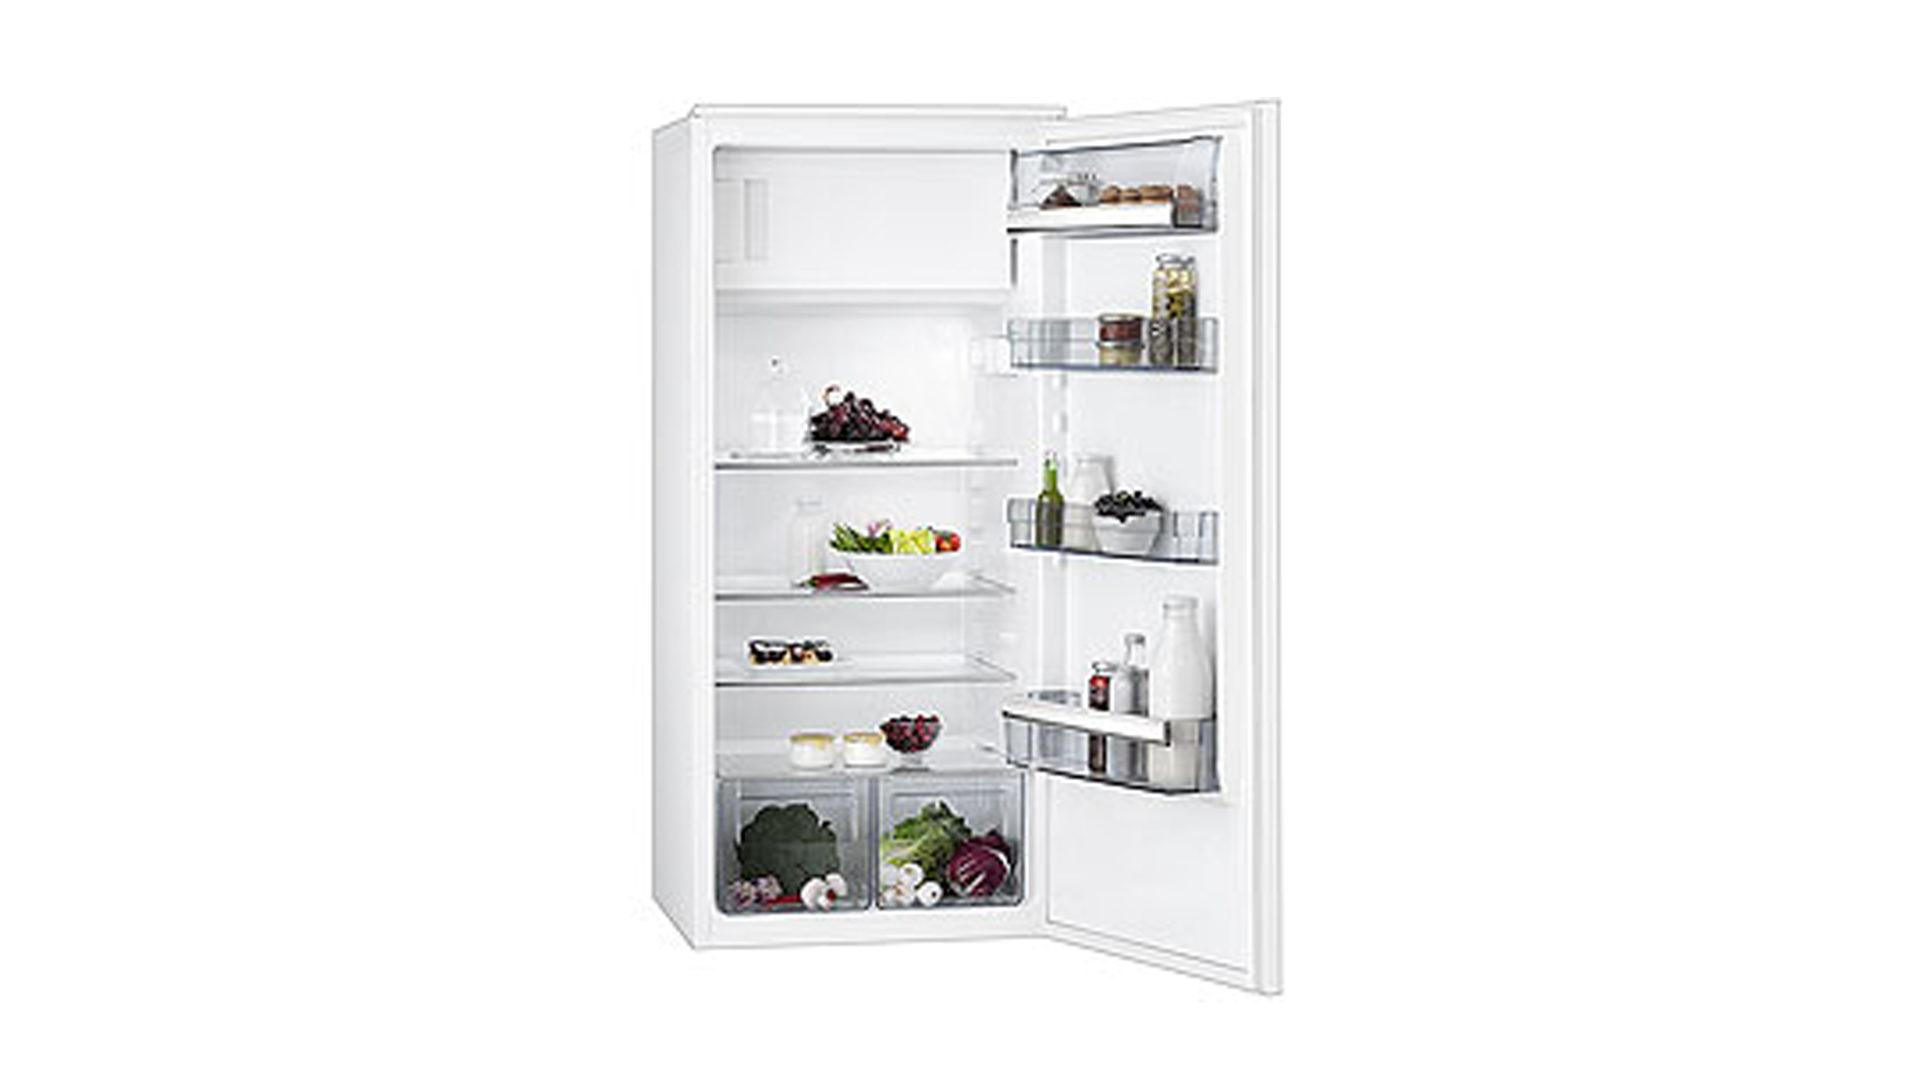 Aeg Kühlschrank Laut : Wohnland breitwieser markenshops kühlschränke aeg aeg